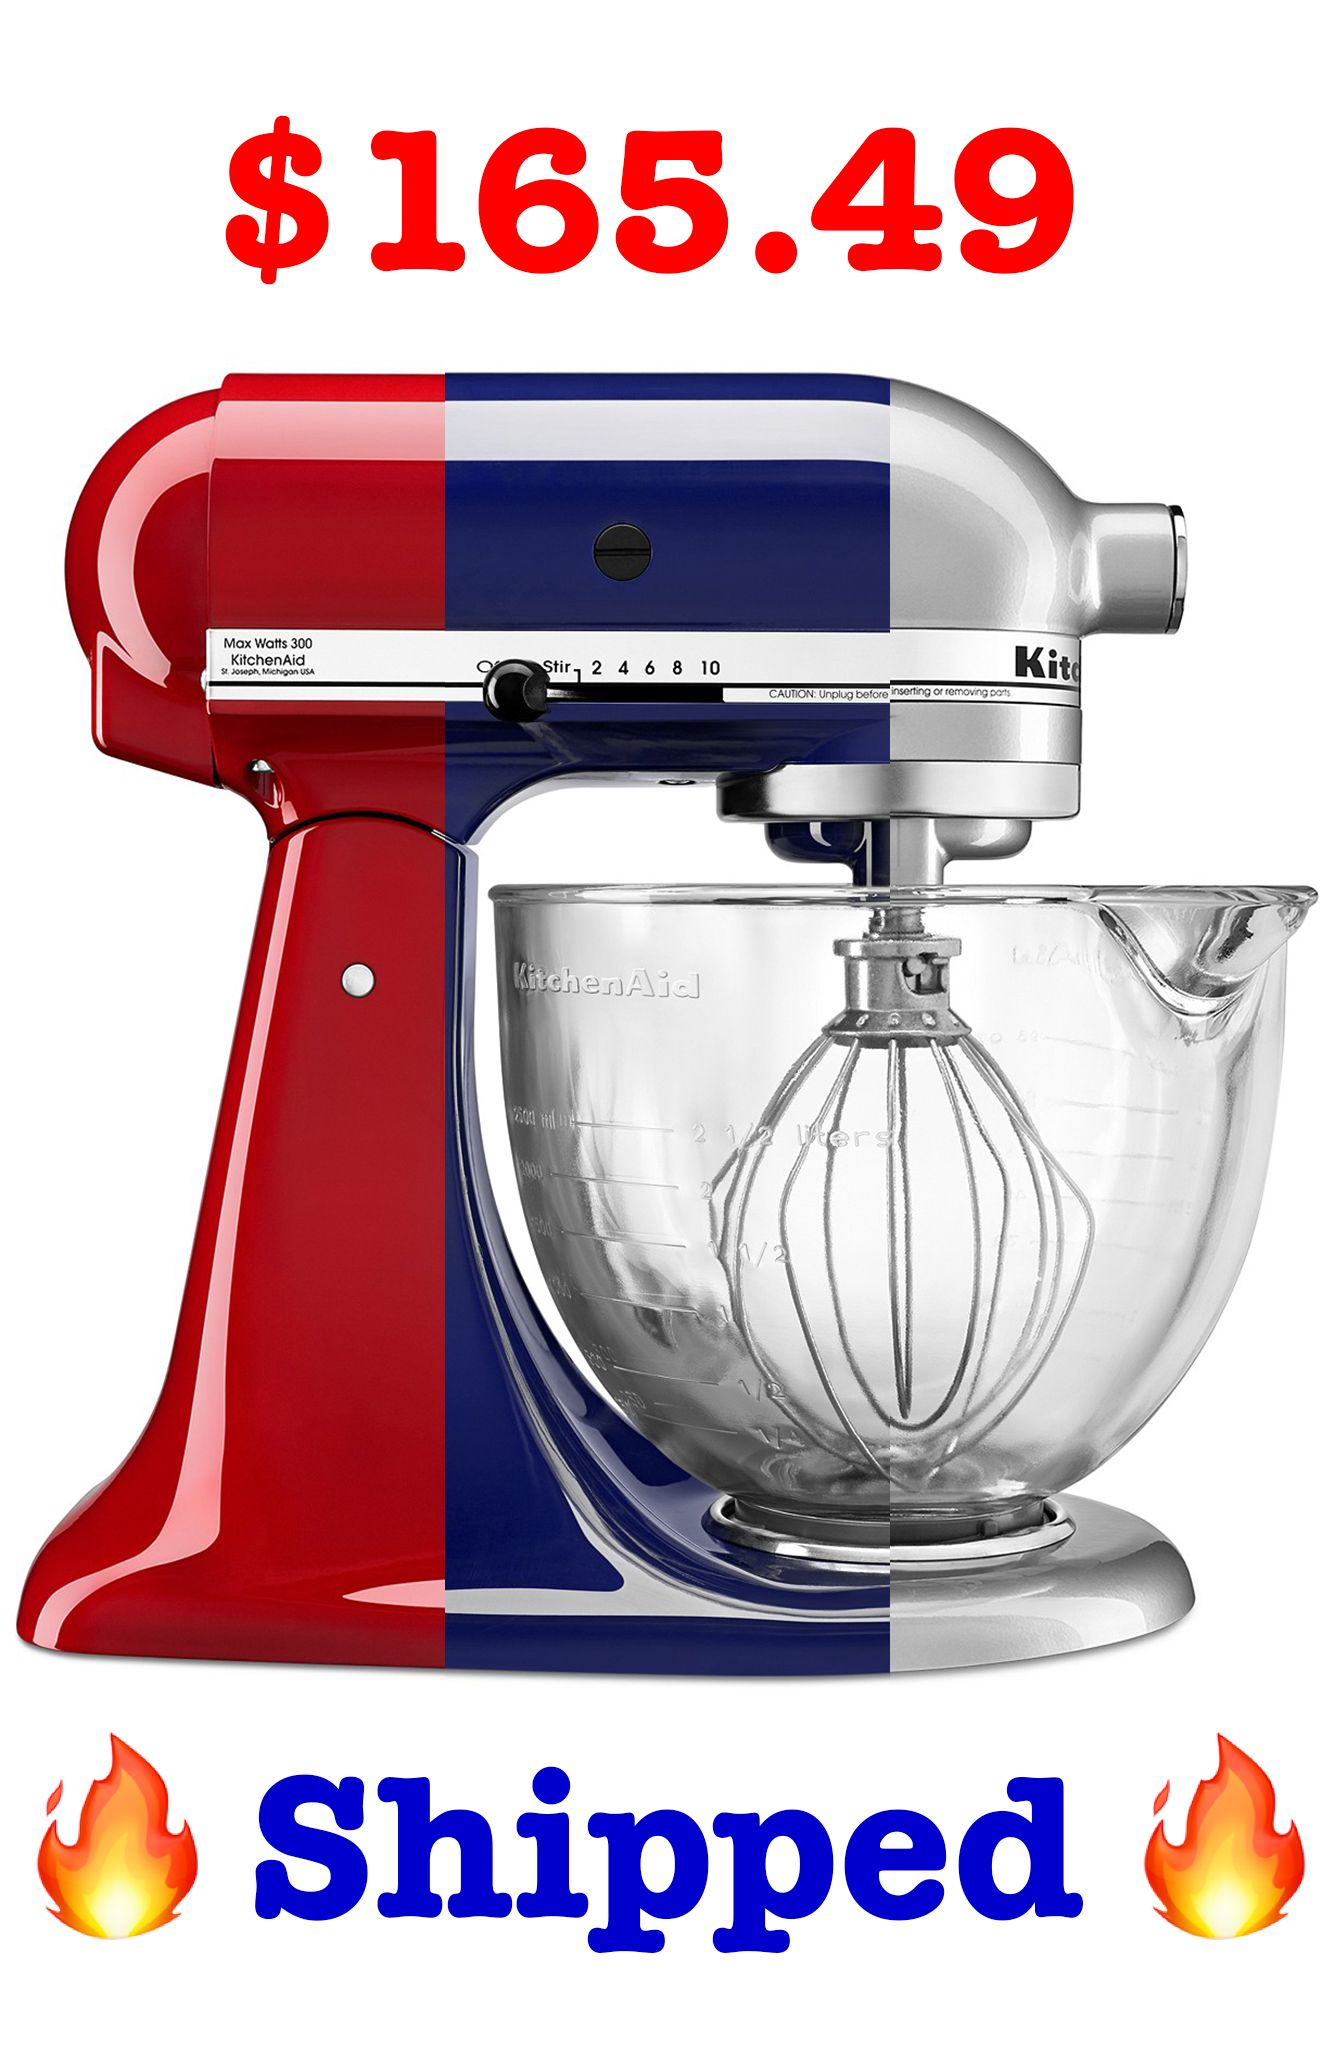 Kitchenaid 5quart stand mixer accessories just 16549